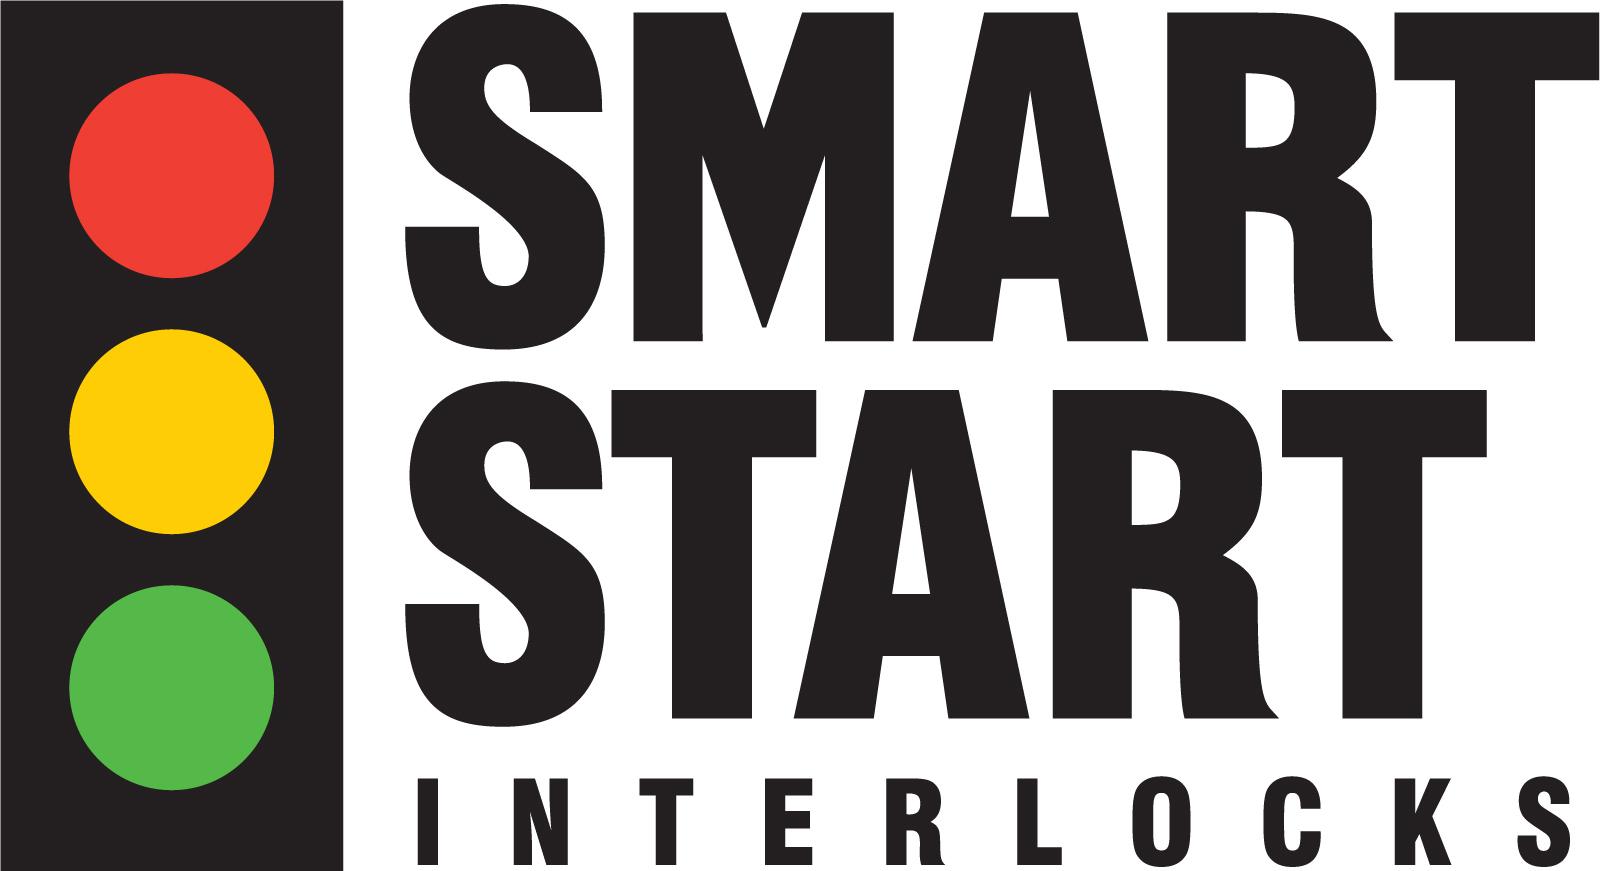 Alcohol Interlocks Smart Start Australia How To Bypass An Ignition Interlock Device Iid